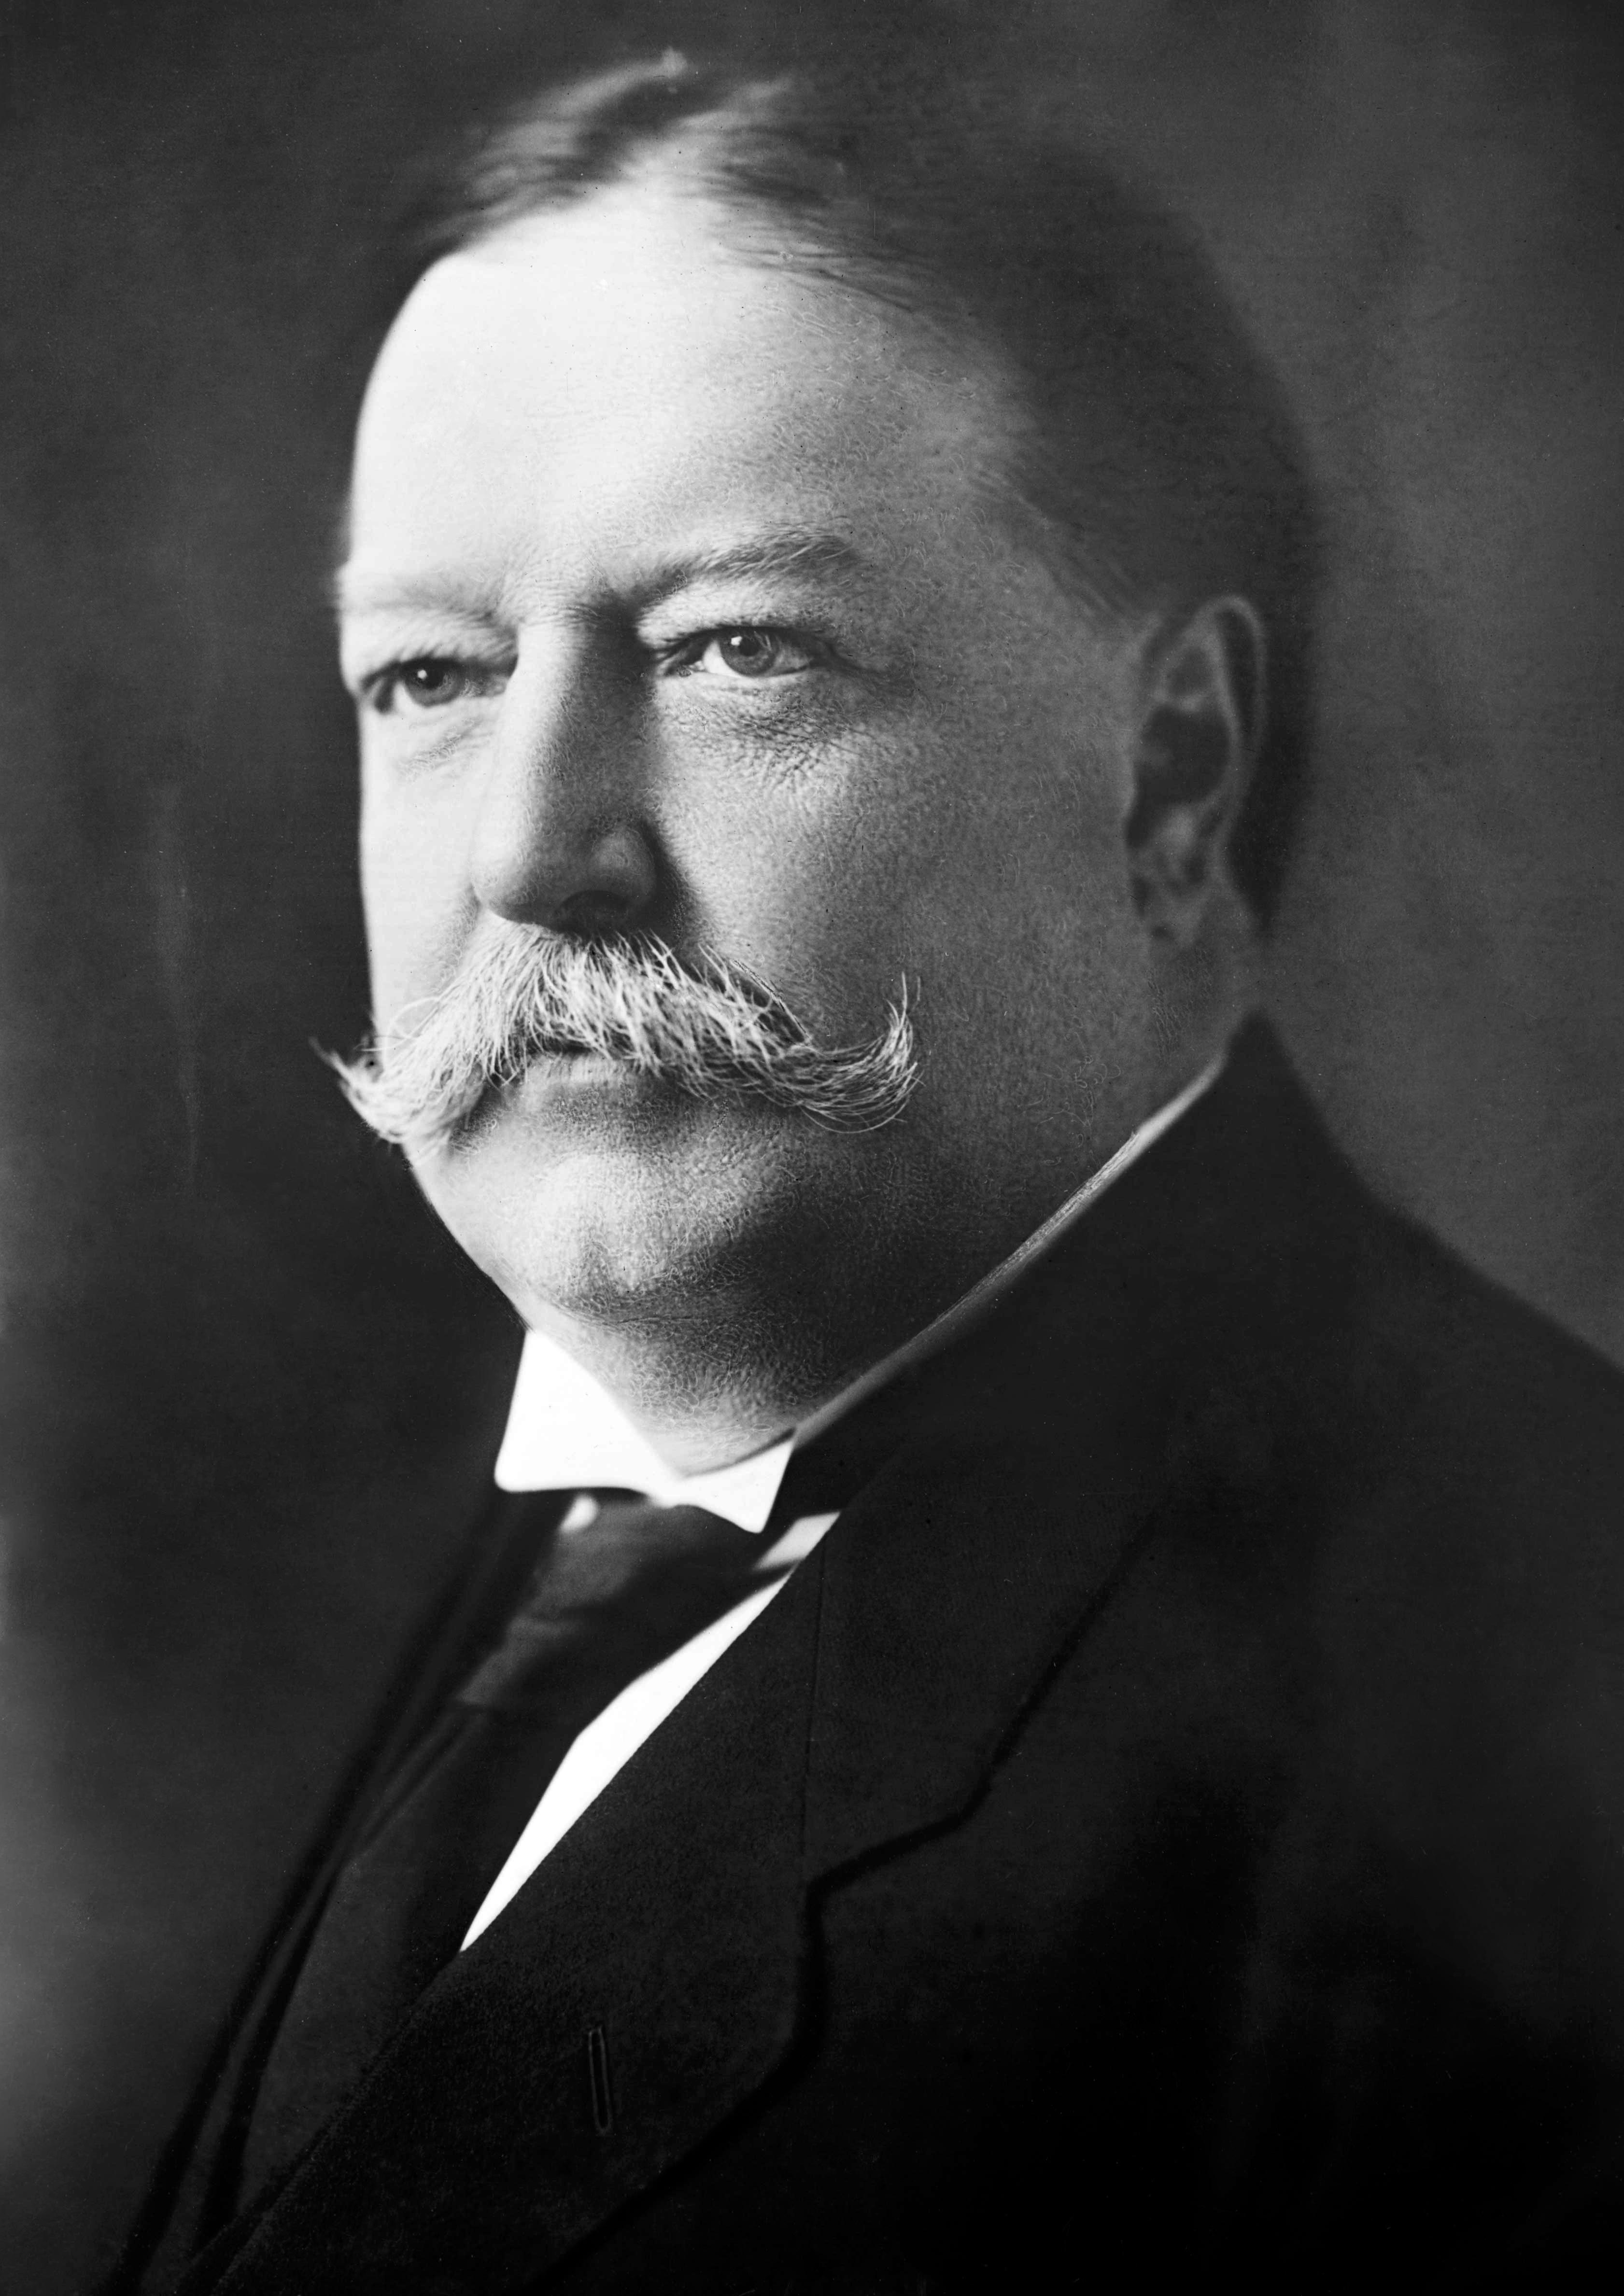 Description William Howard Taft  Bain bw photo portrait  1908 jpgWilliam Taft